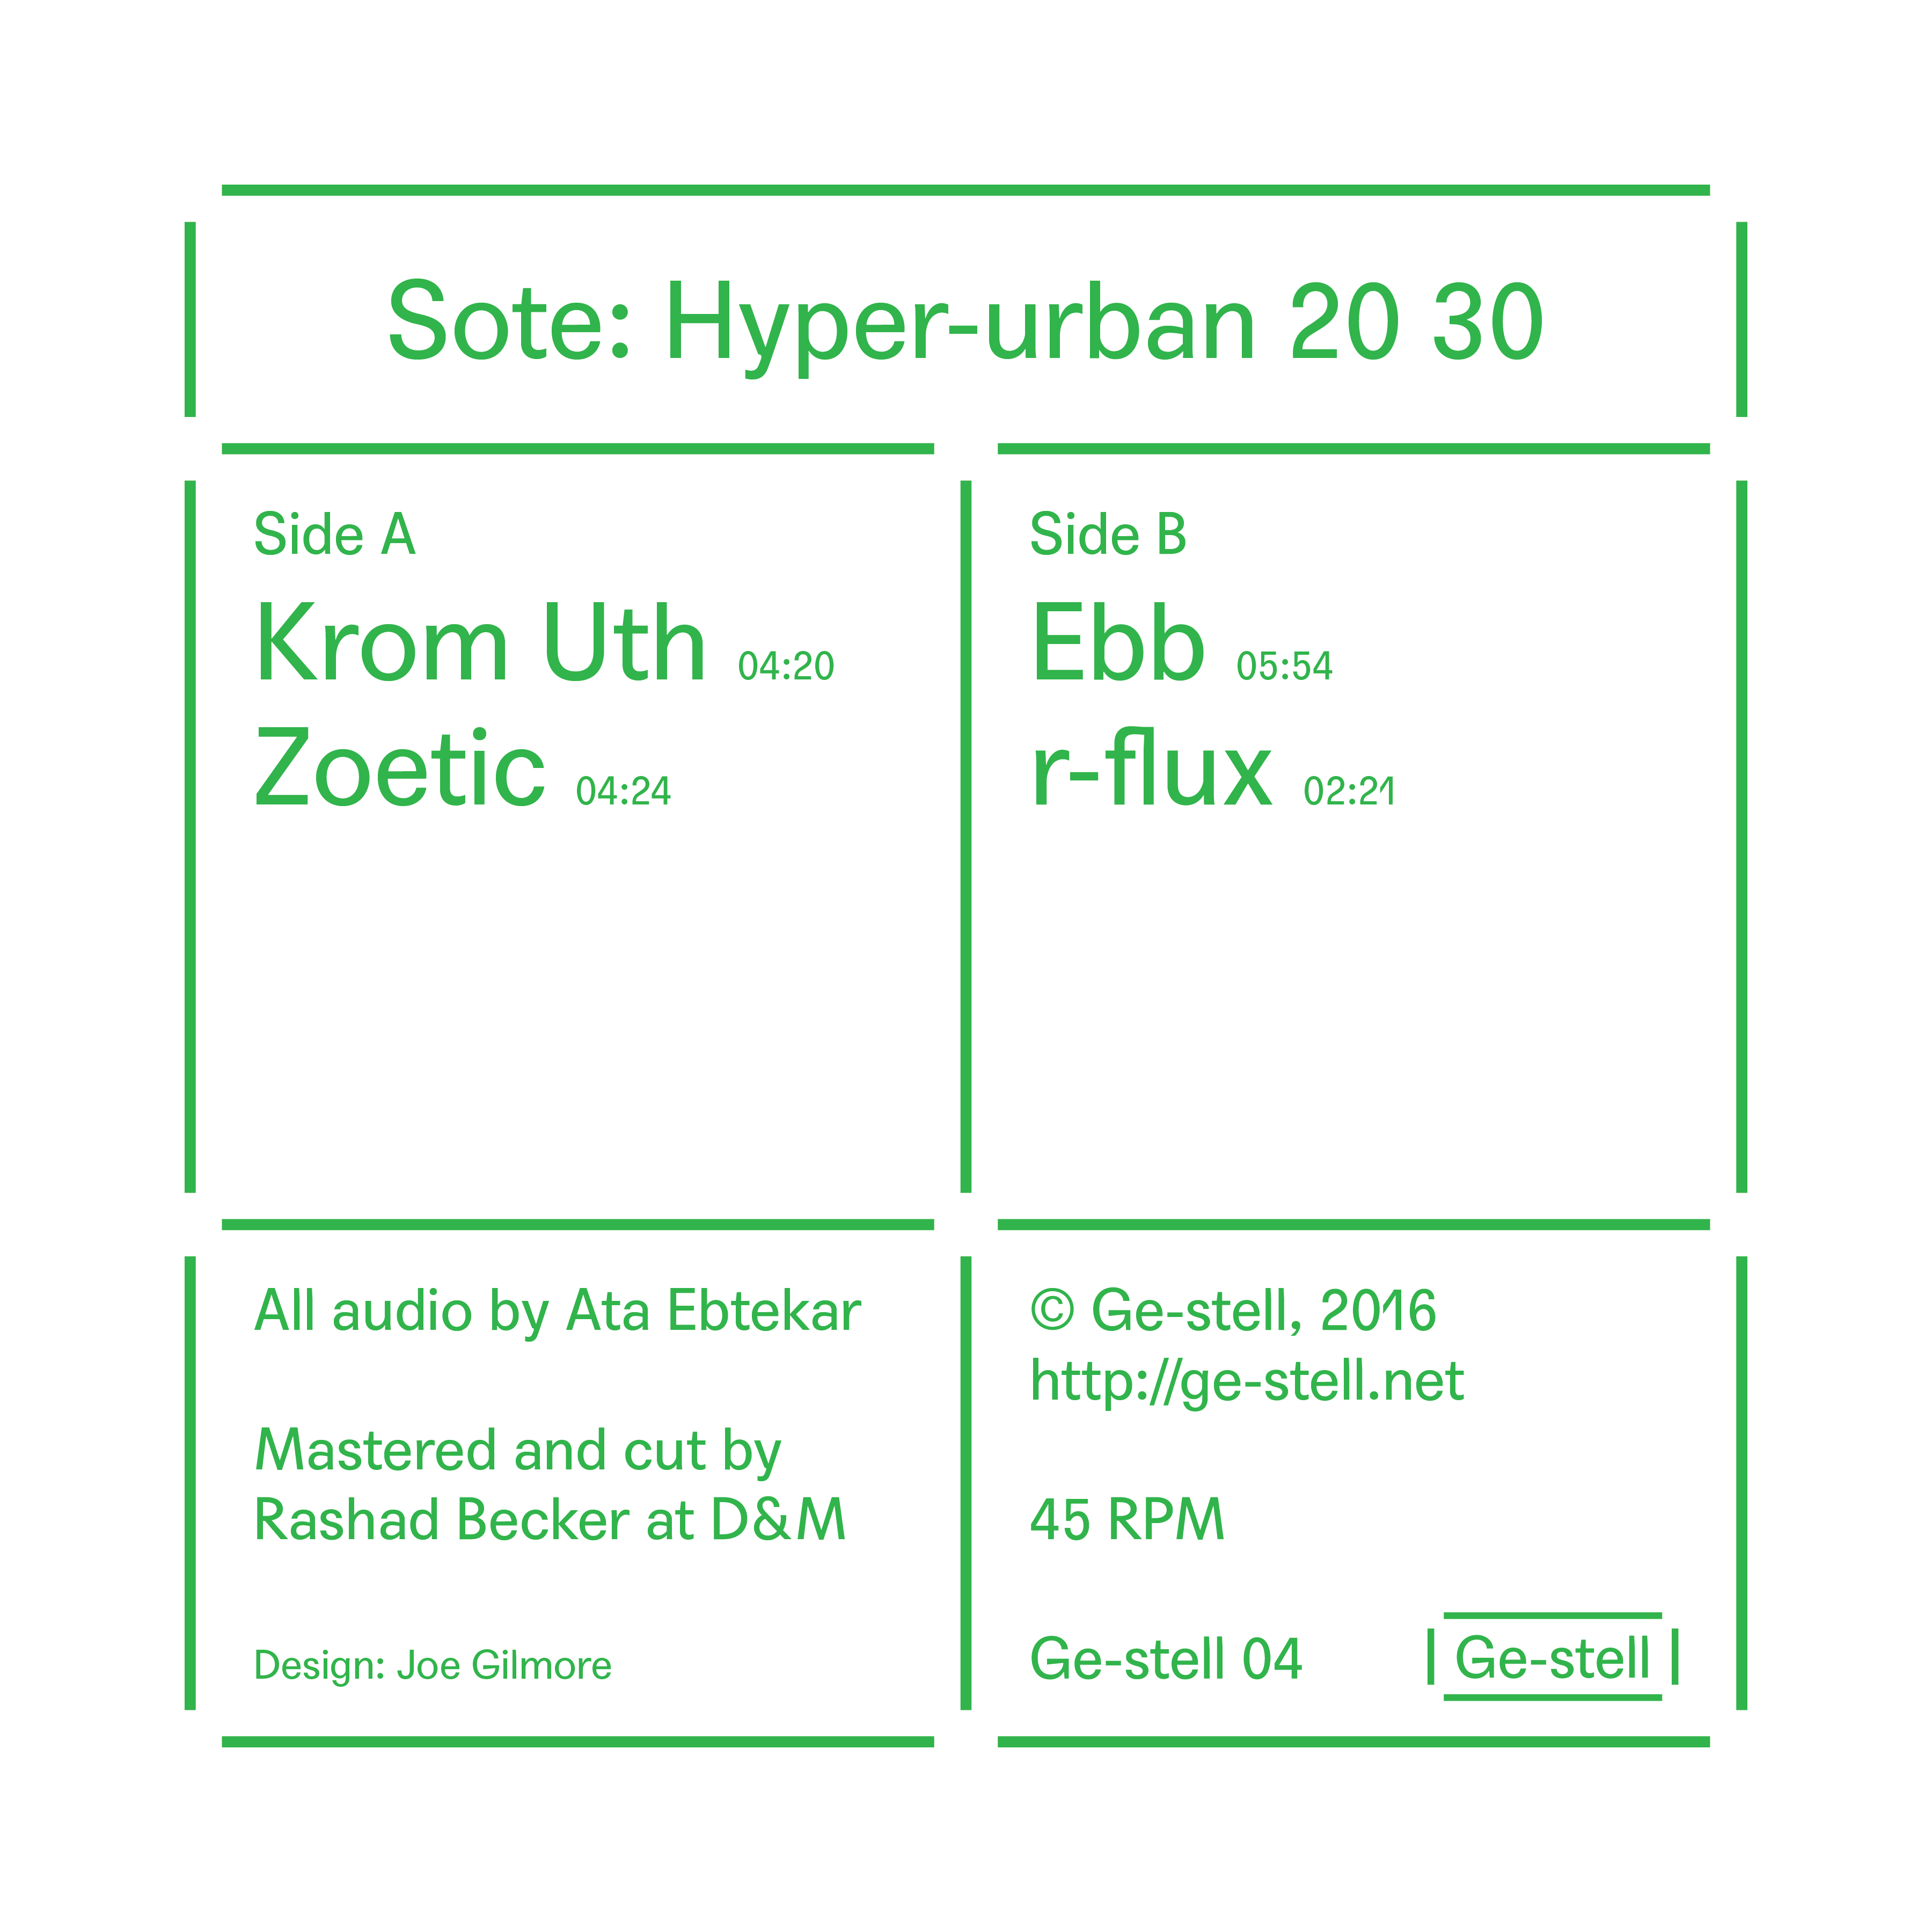 Sote - Hyper-urban 20 30 (EP)